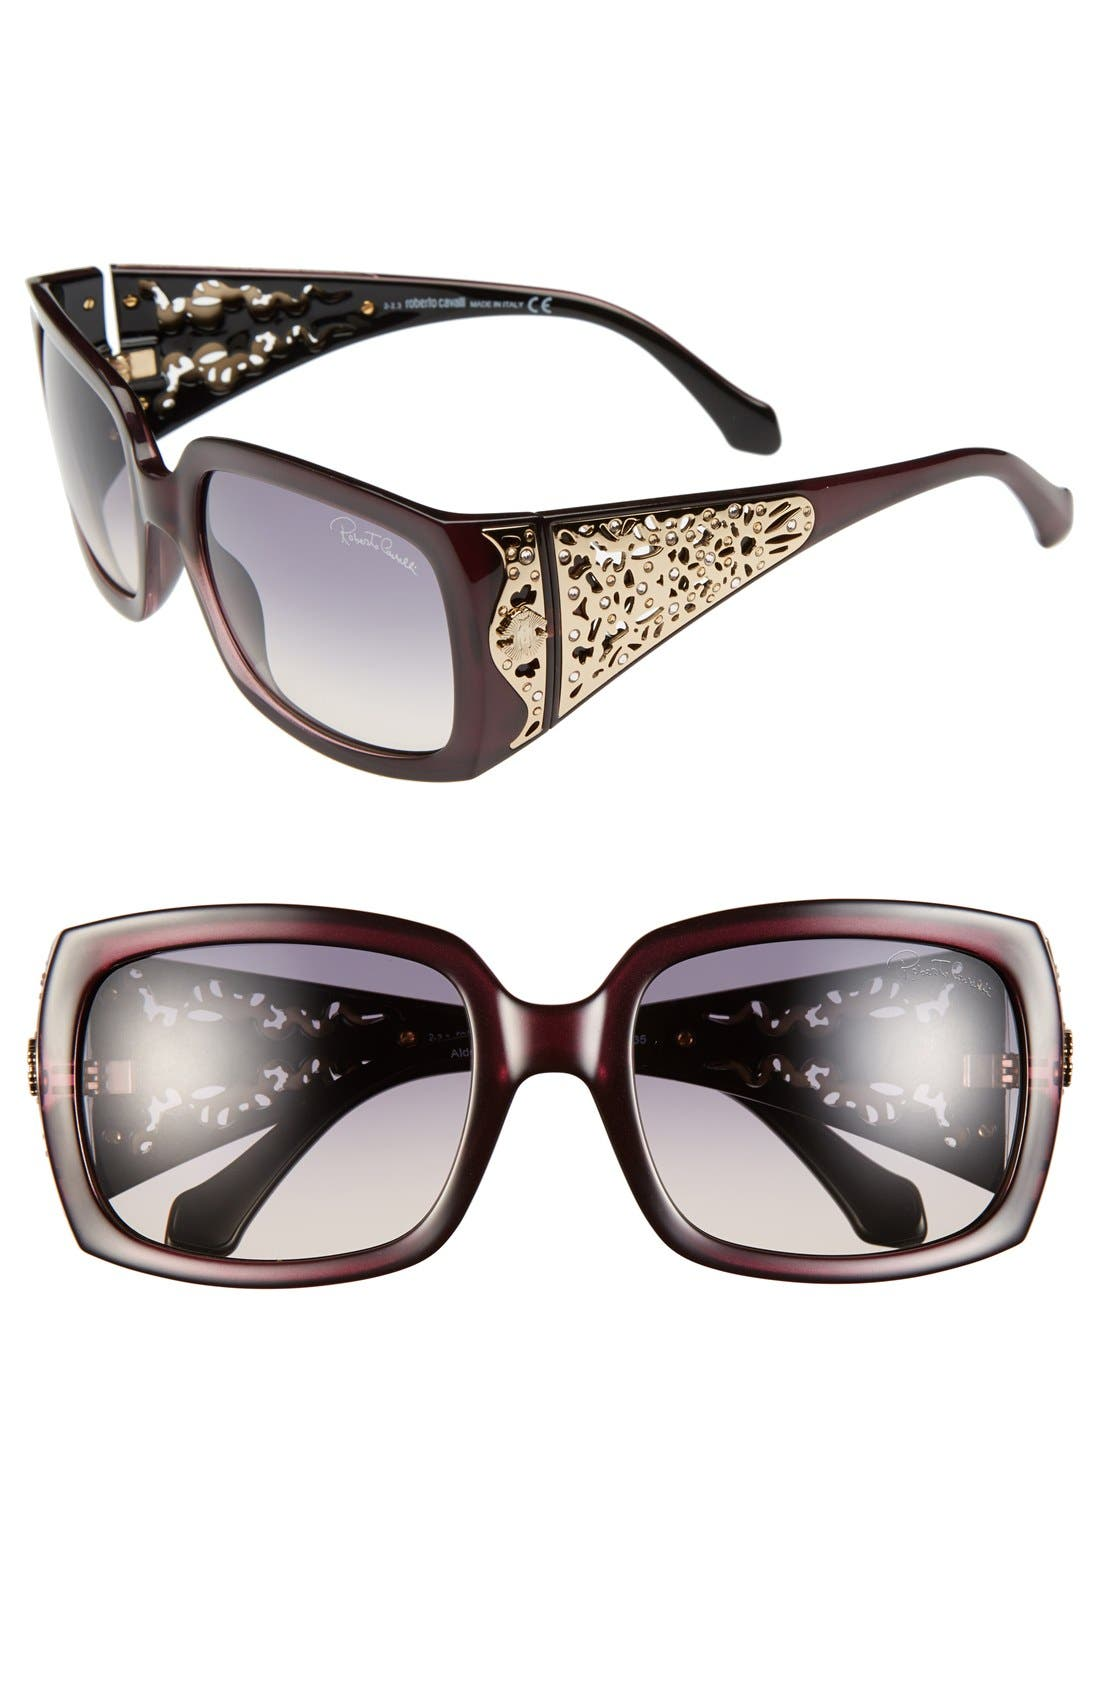 Alternate Image 1 Selected - Roberto Cavalli 'Aldebaran' 59mm Square Sunglasses